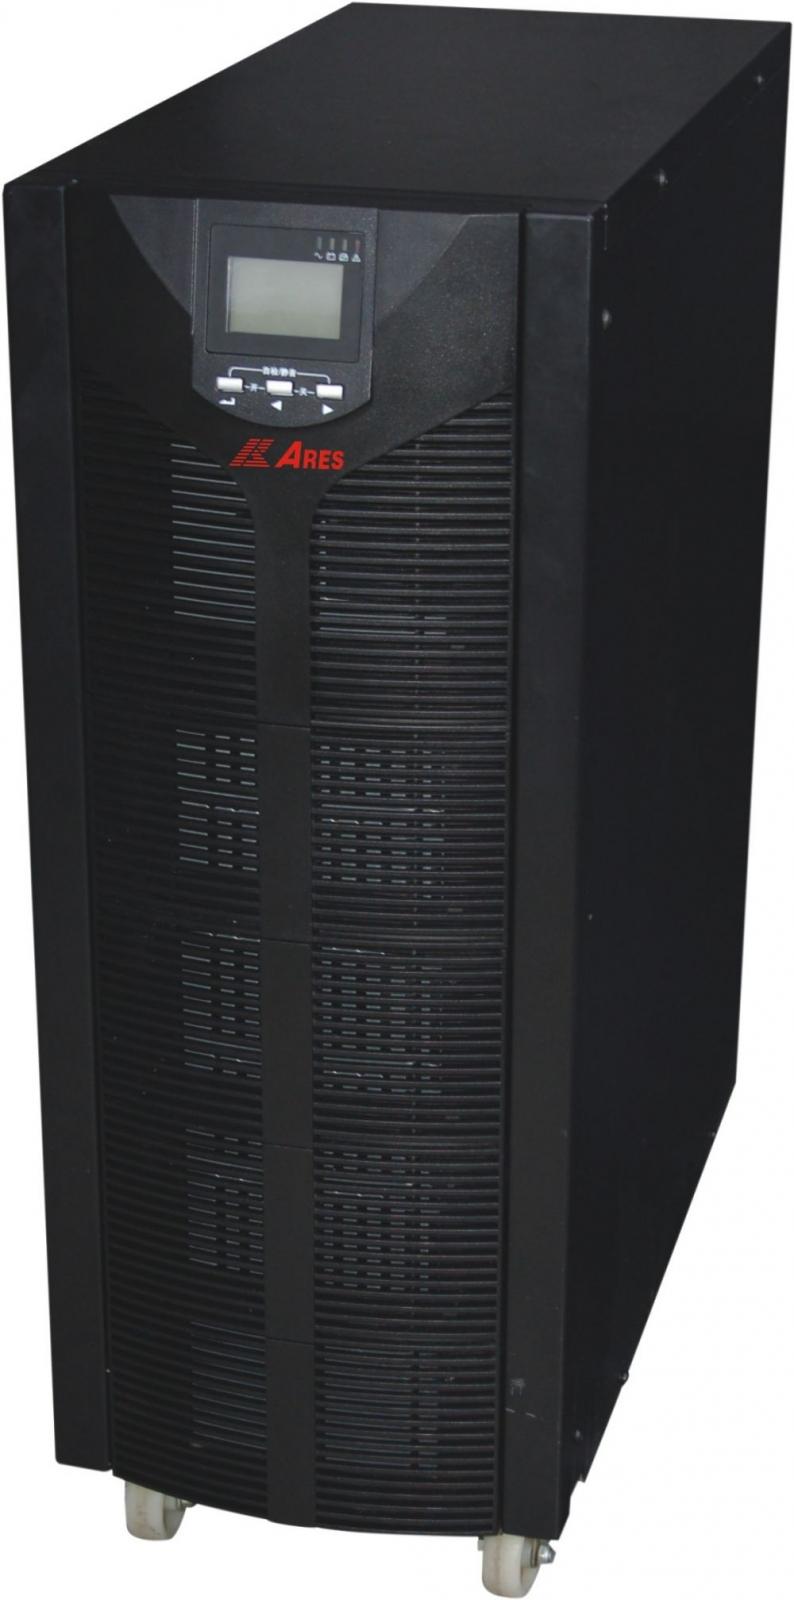 UPS 6KVA Ares AR906IIH (5400w) Online Tower